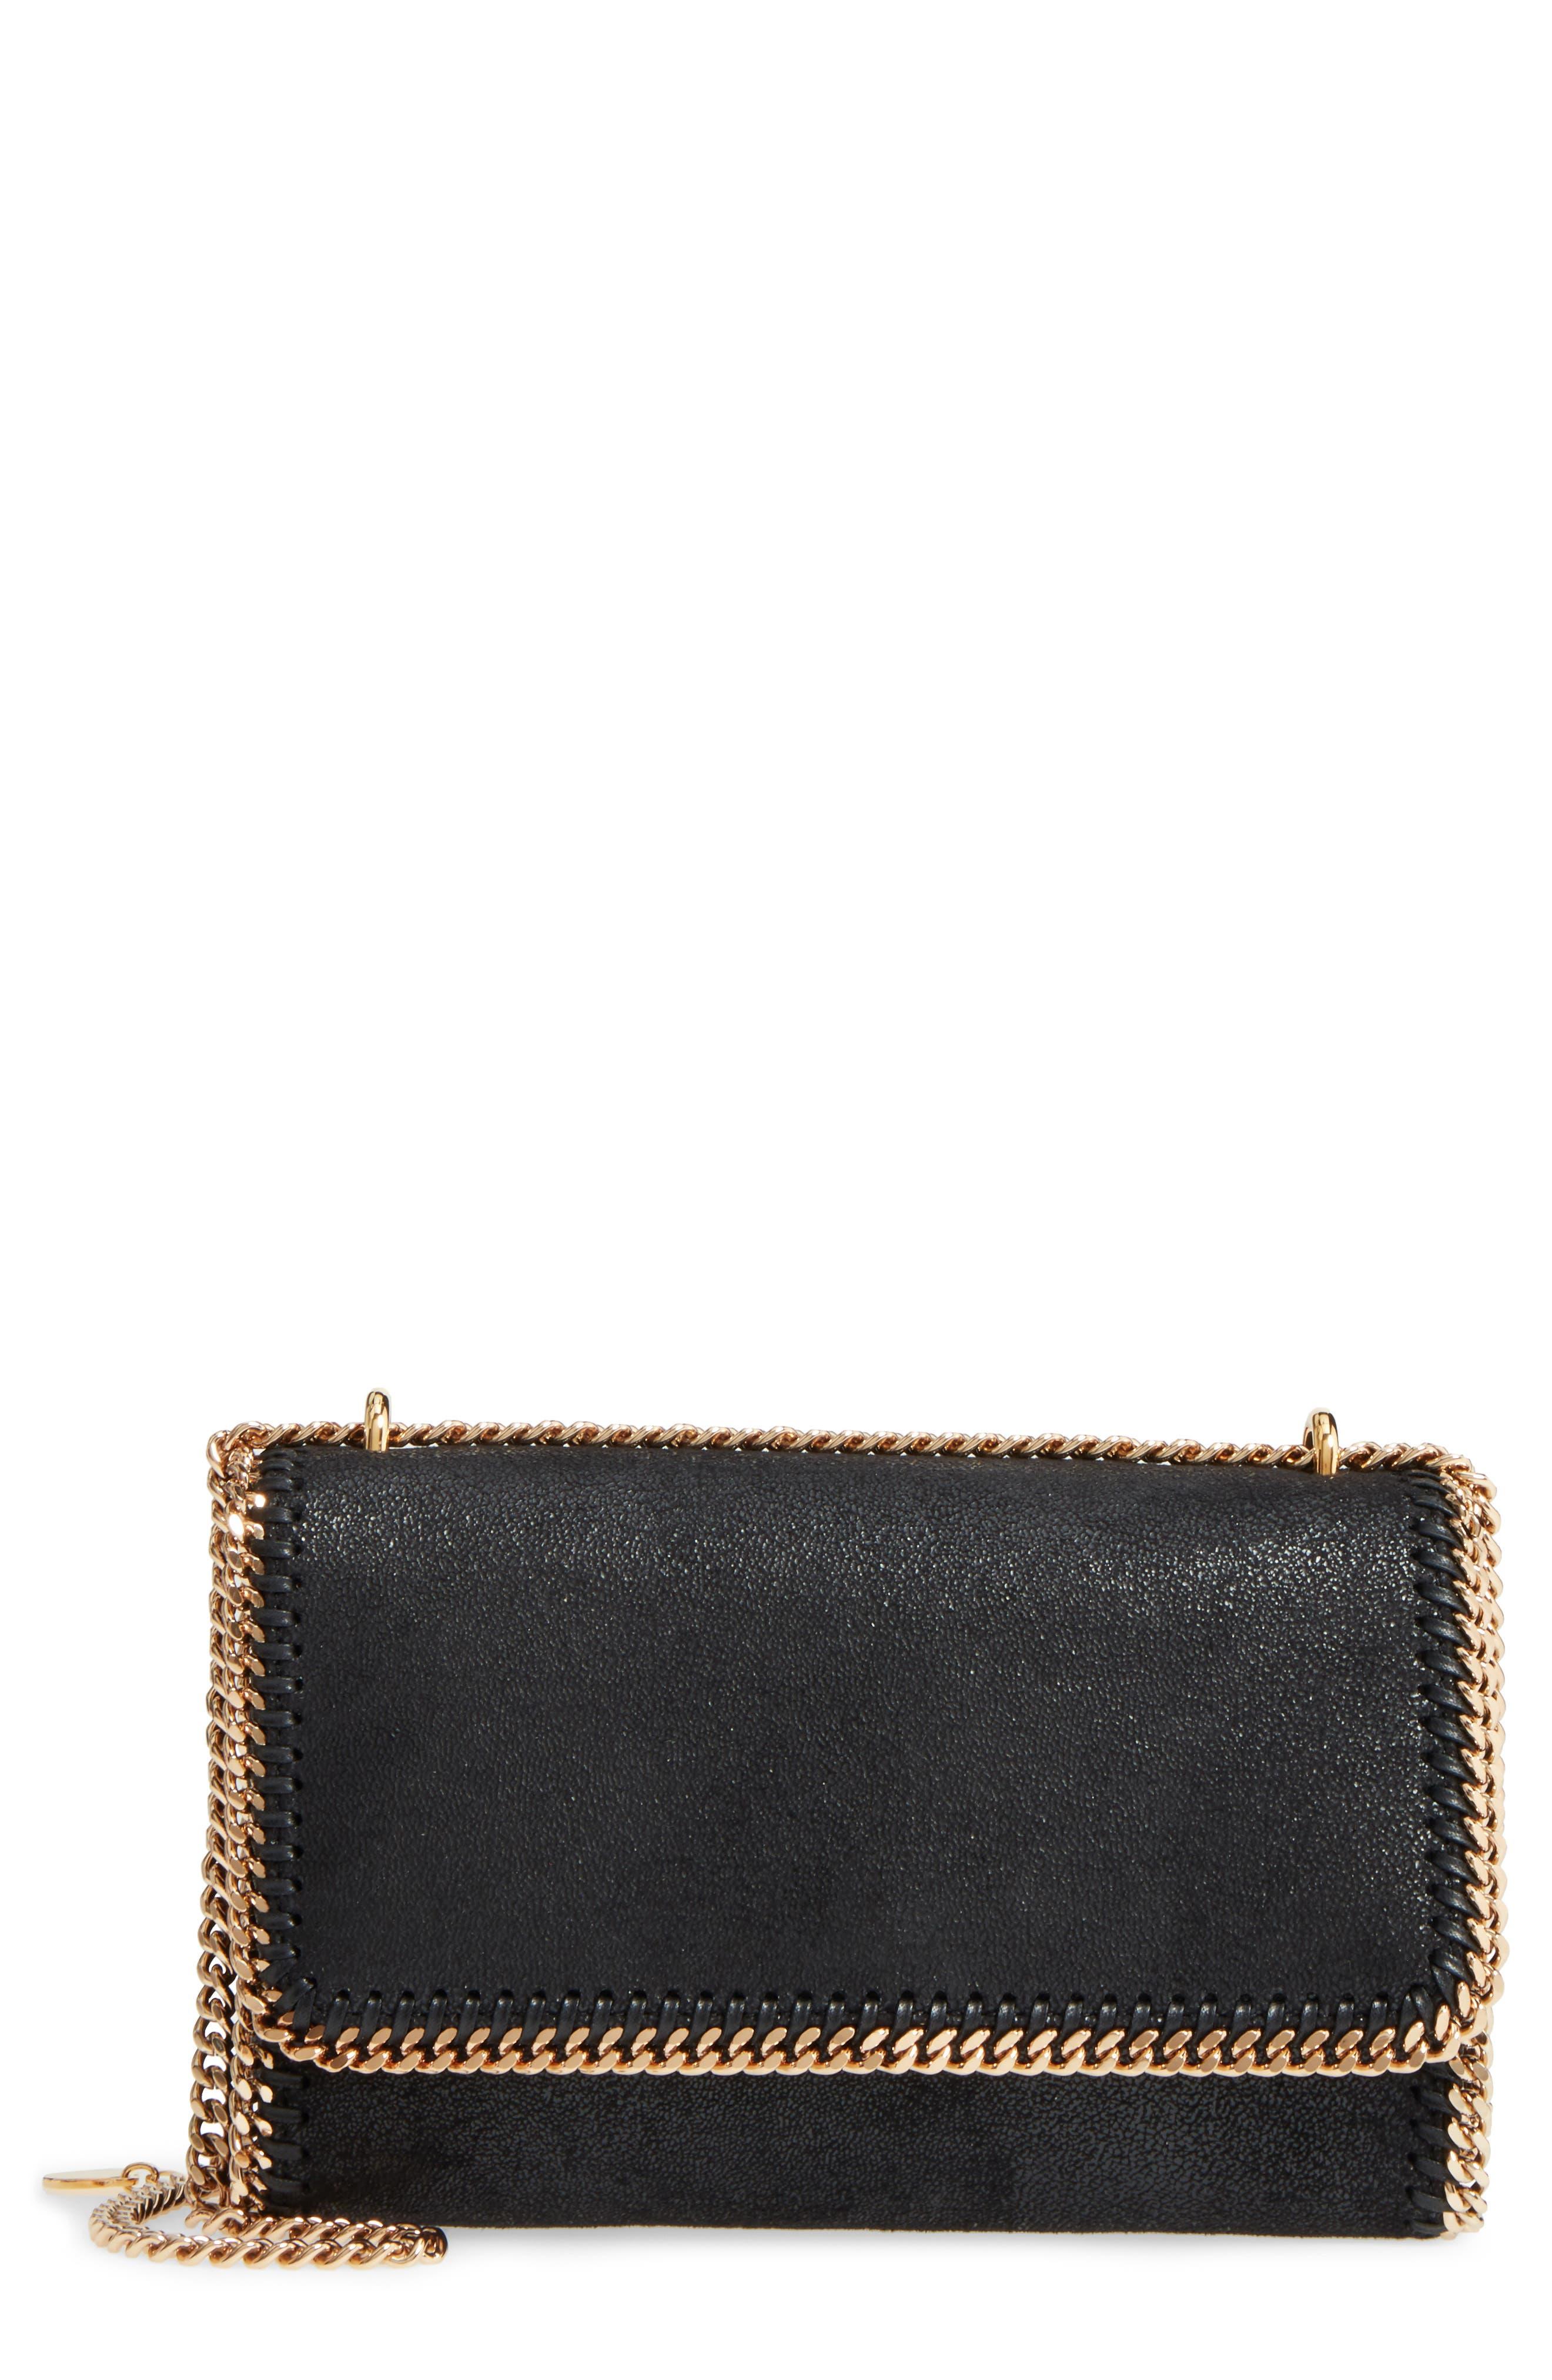 Falabella Shaggy Deer Faux Leather Shoulder Bag,                             Main thumbnail 1, color,                             BLACK